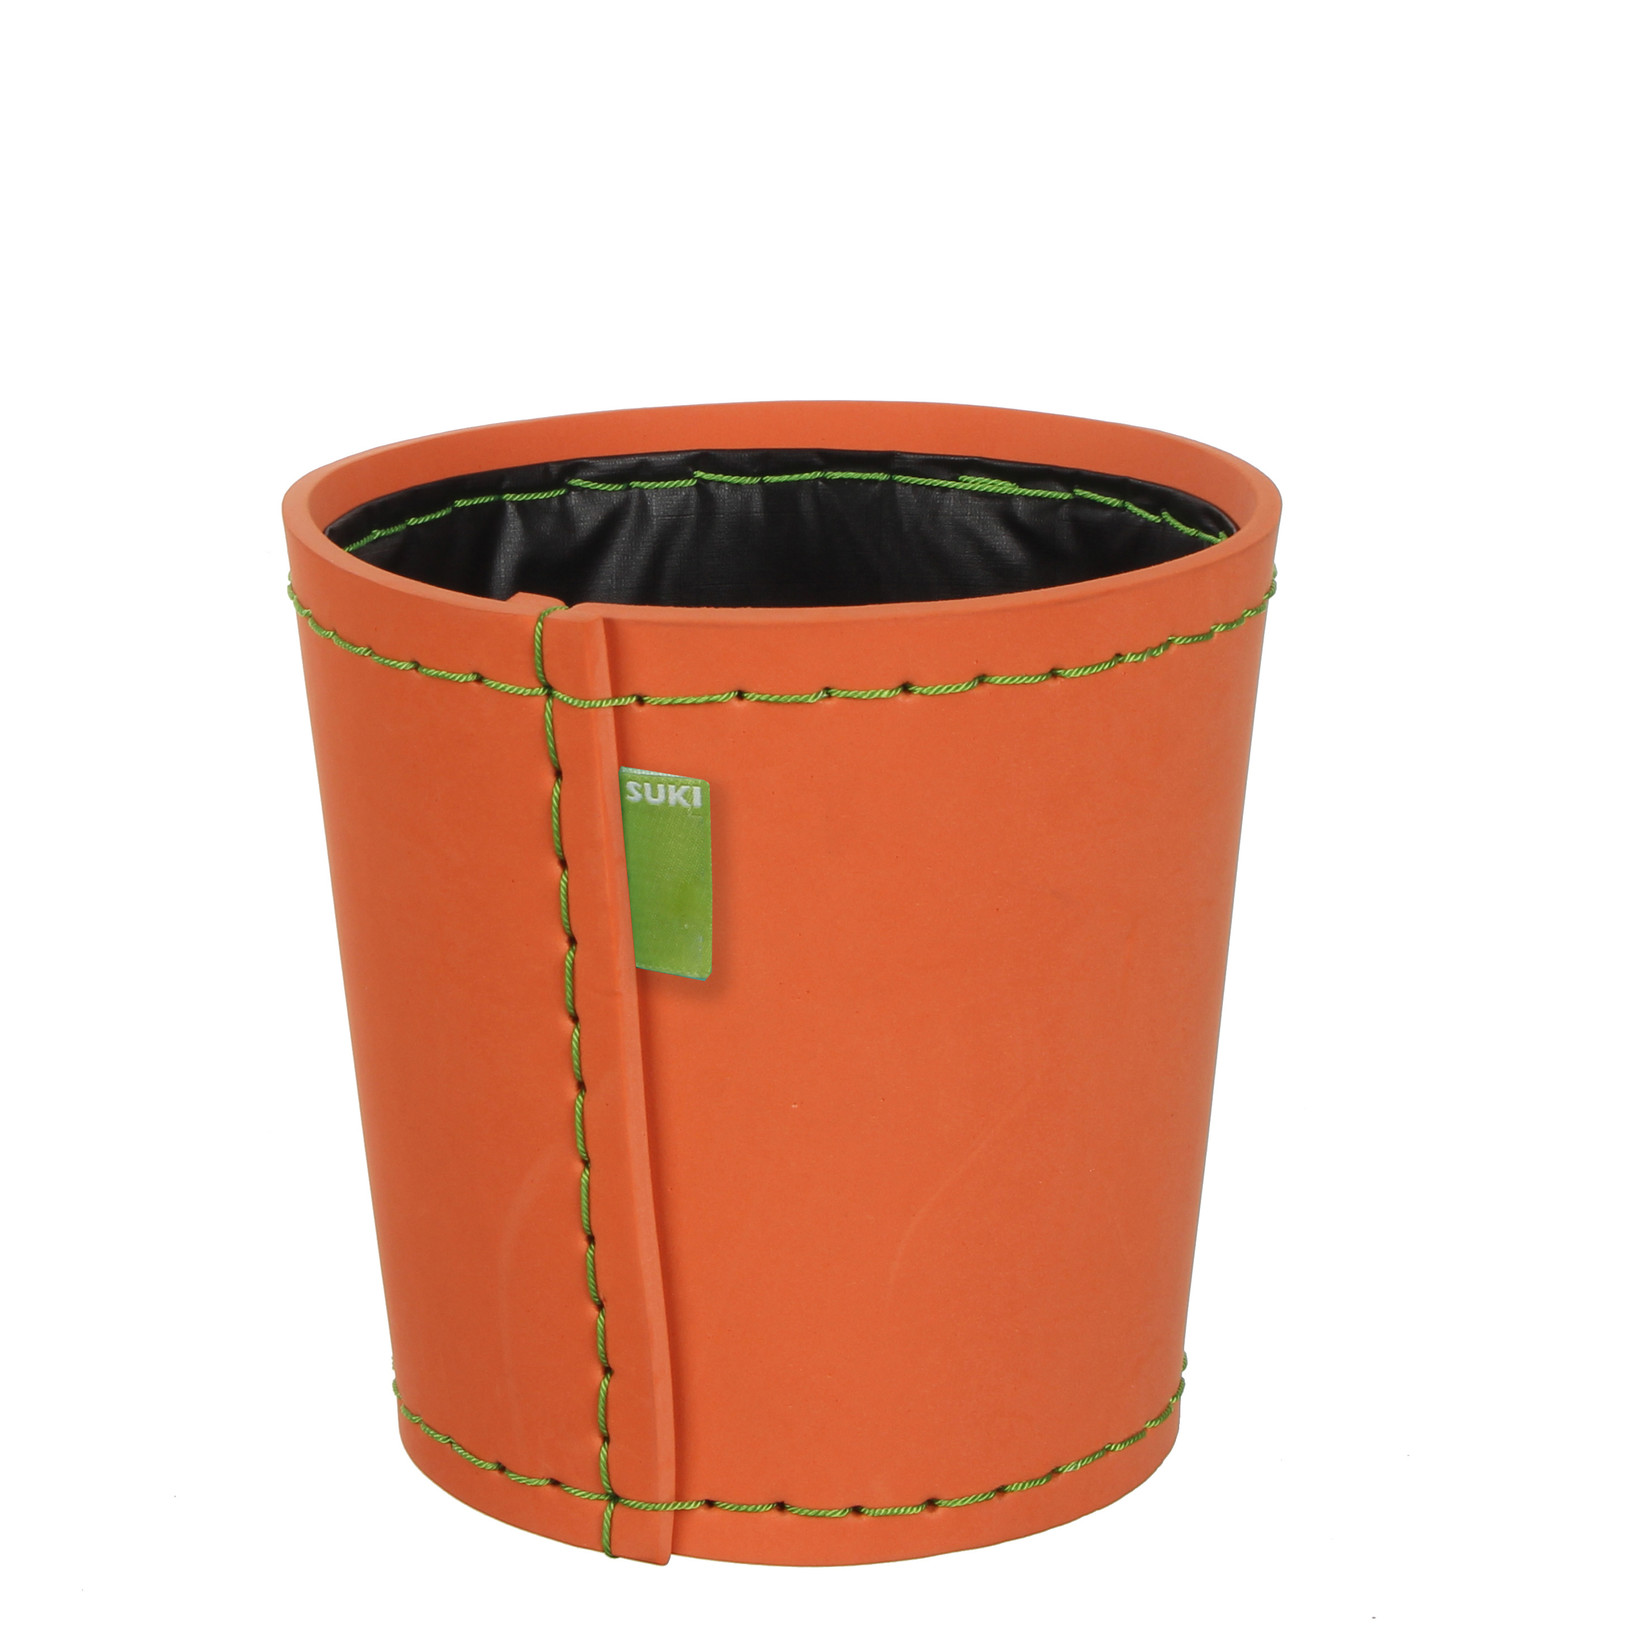 MiCa 153463 Pot around Suki orange